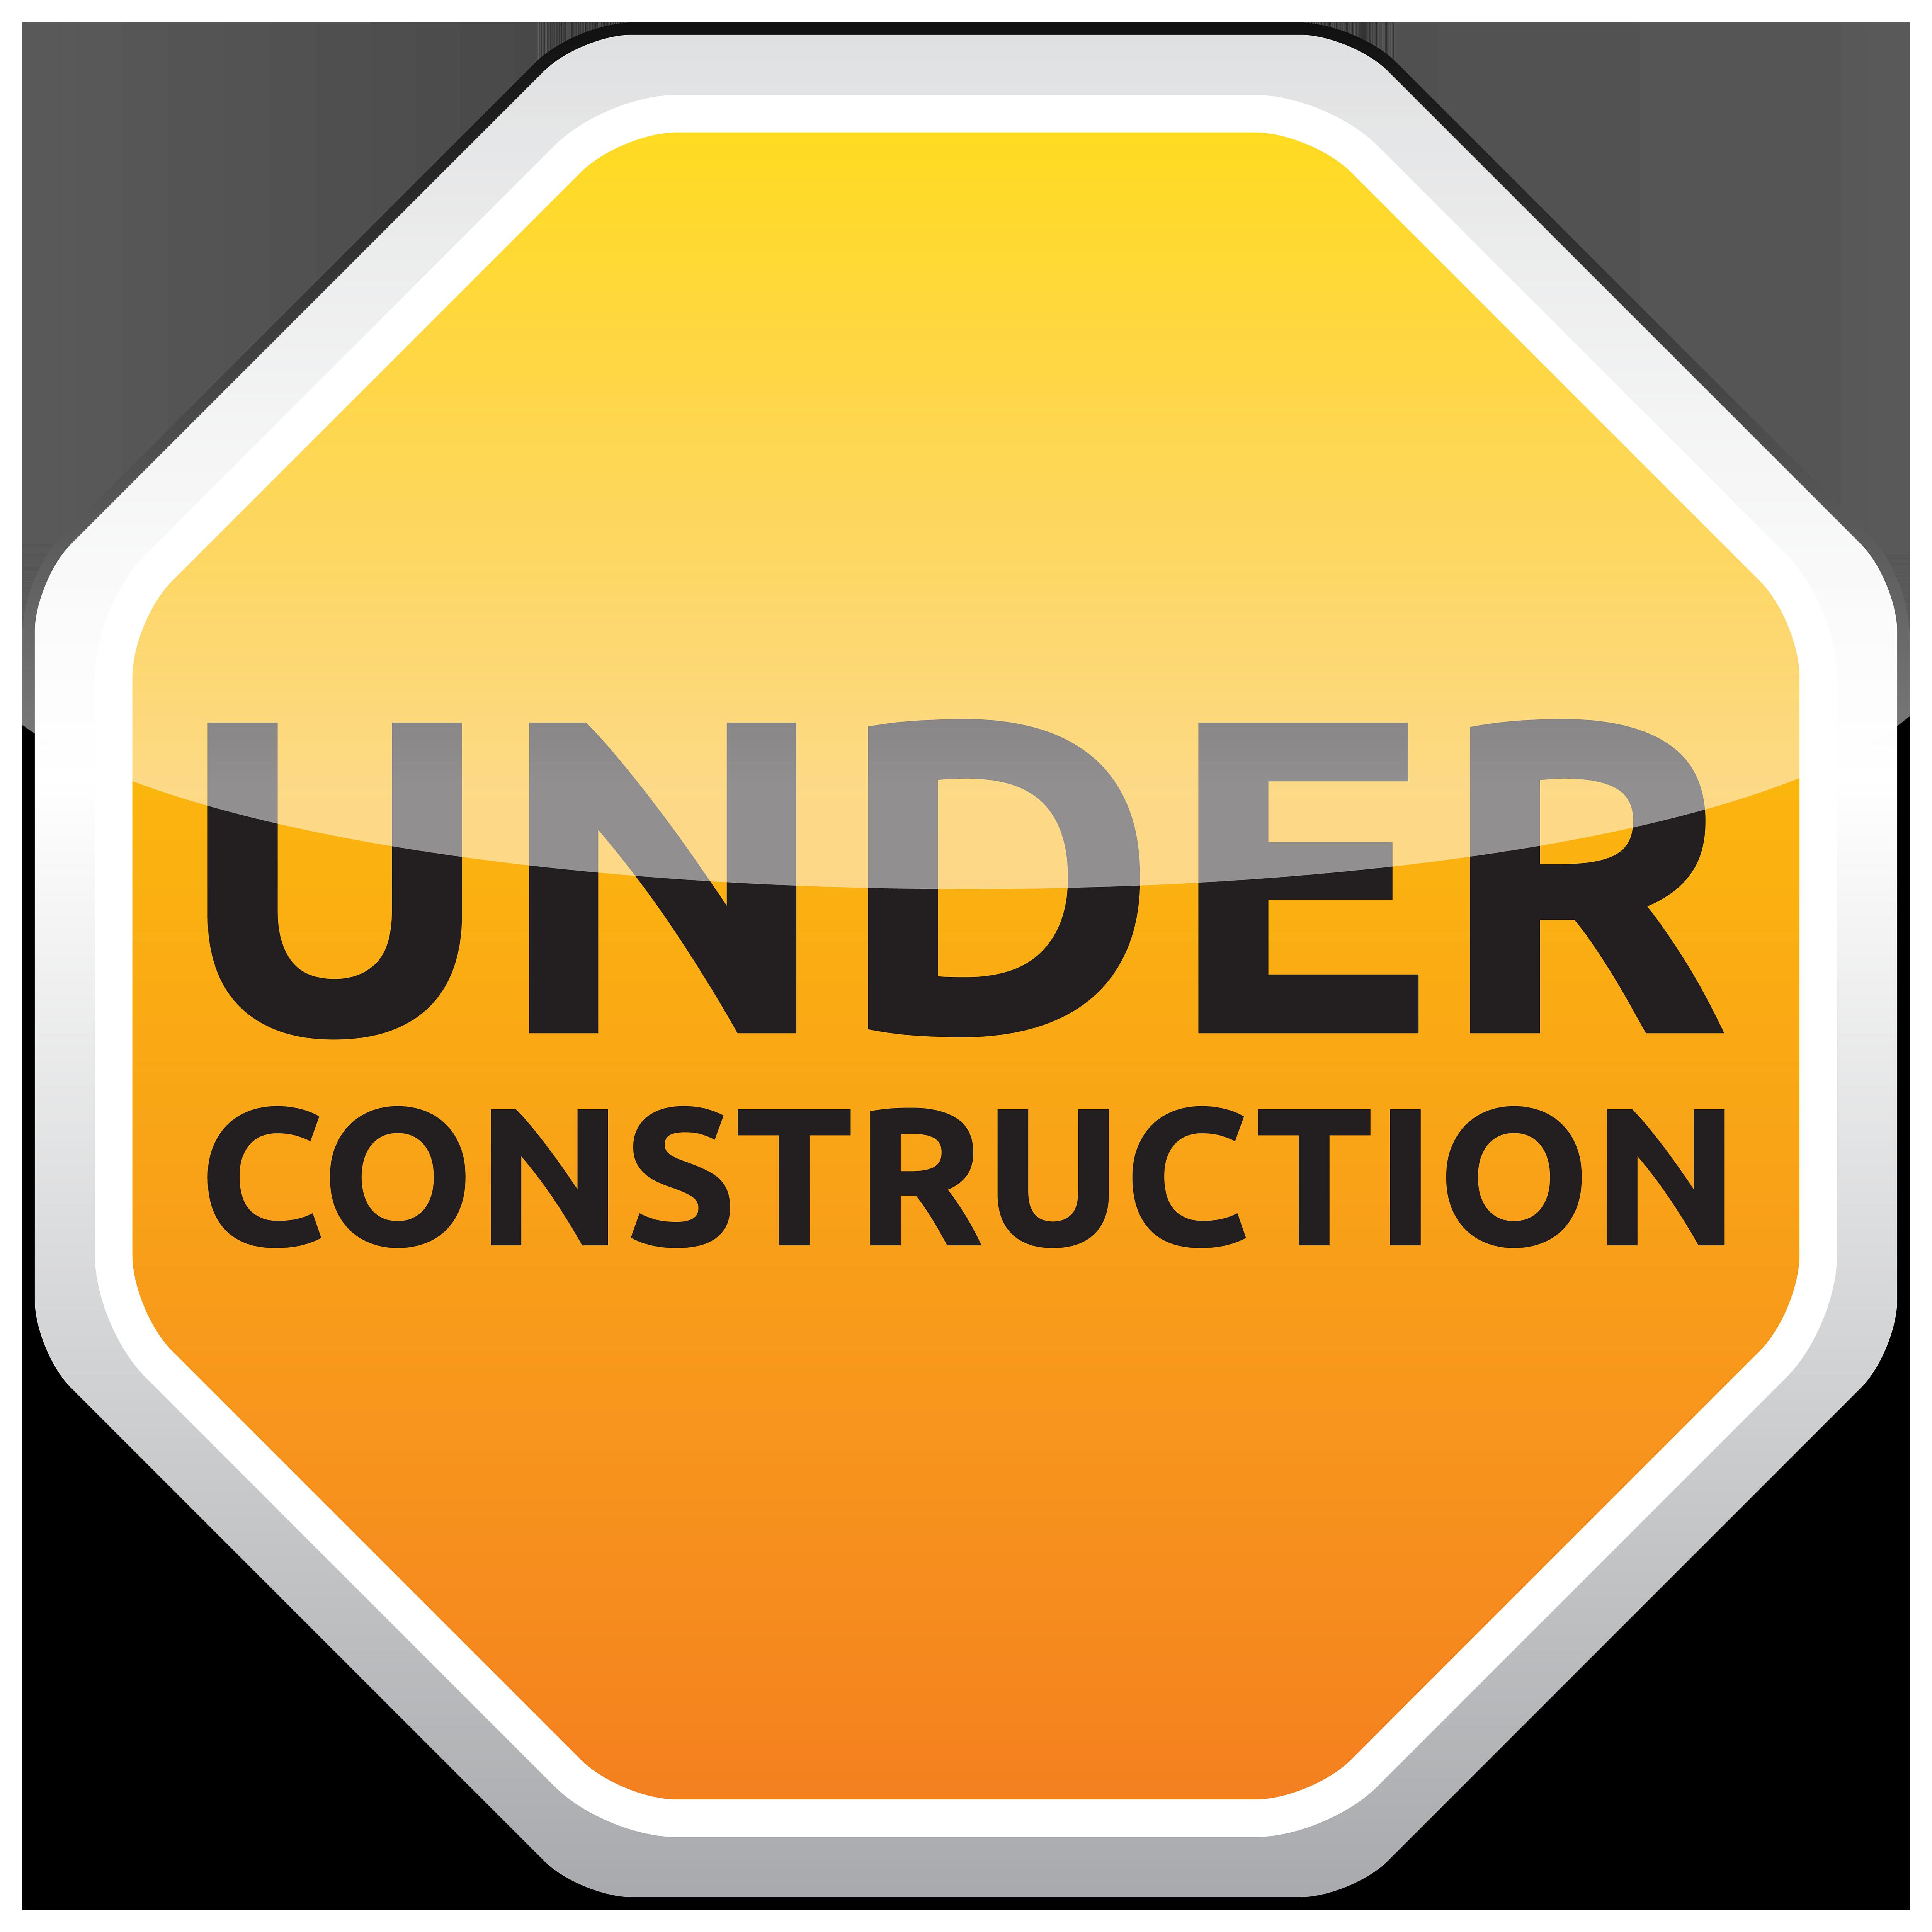 Under construction clipart sign clipart transparent download Under Construction Sign PNG Clipart - Best WEB Clipart clipart transparent download